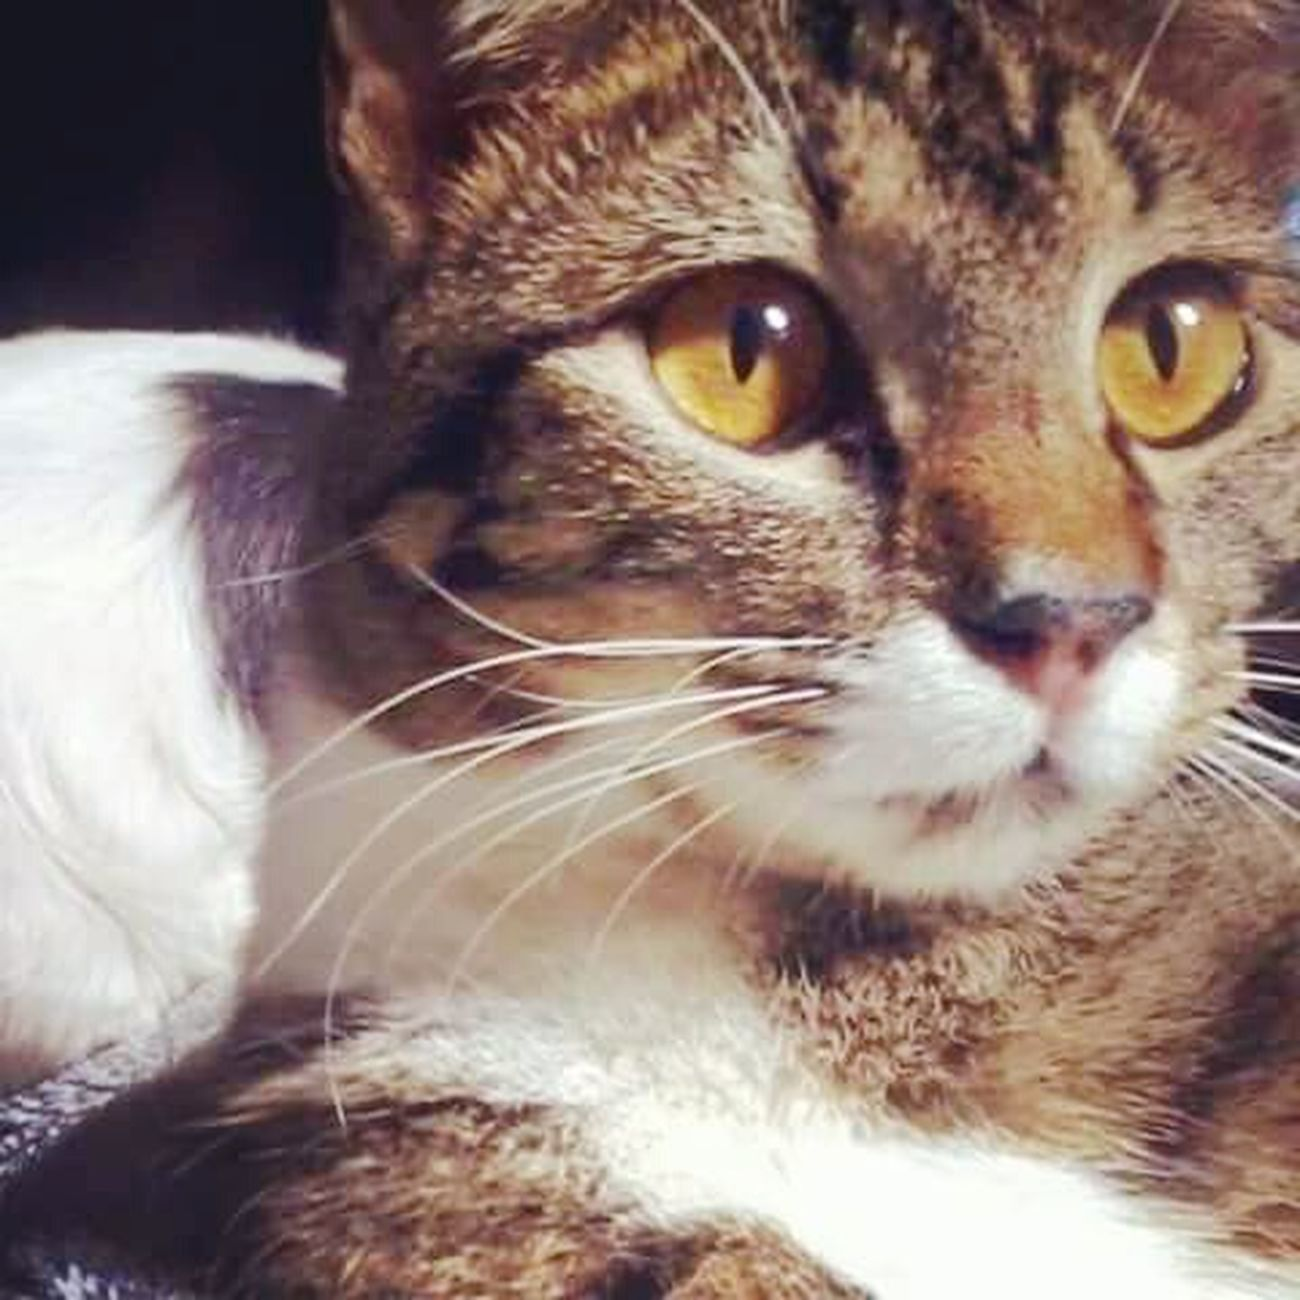 Whisky ♥ Gato Felino Amorsemlimites Meuciumentofavorito MeuGato Obrigadosenhor